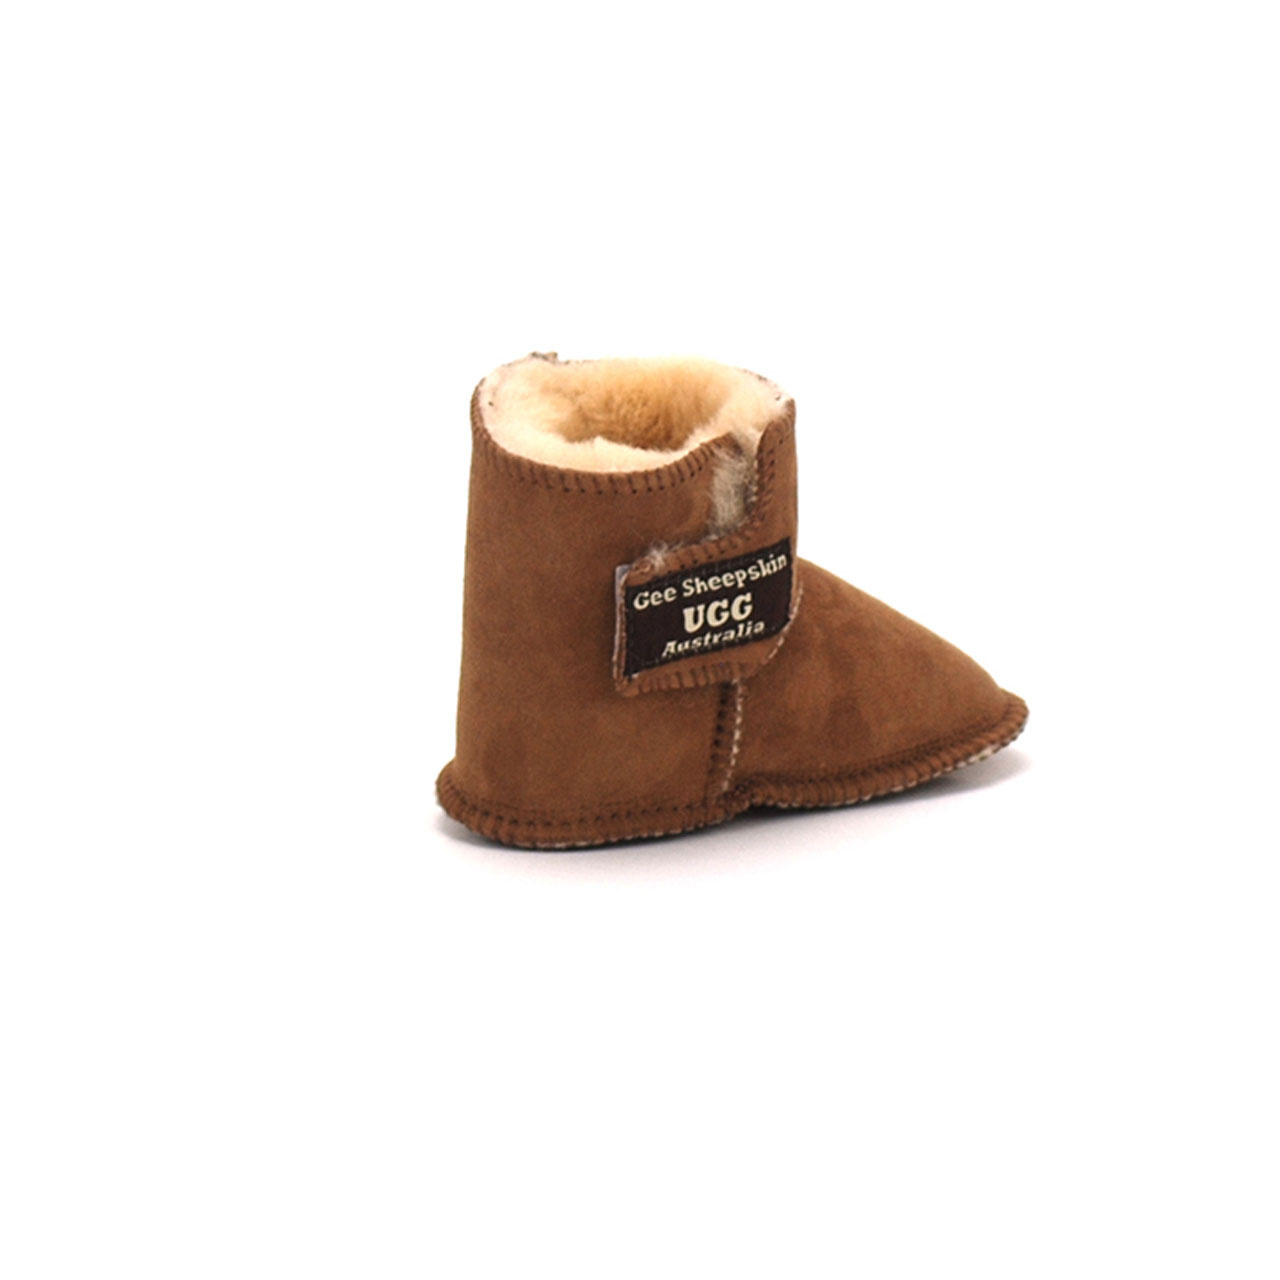 Ugg Boots Baby Booties Cinnamon - Gee